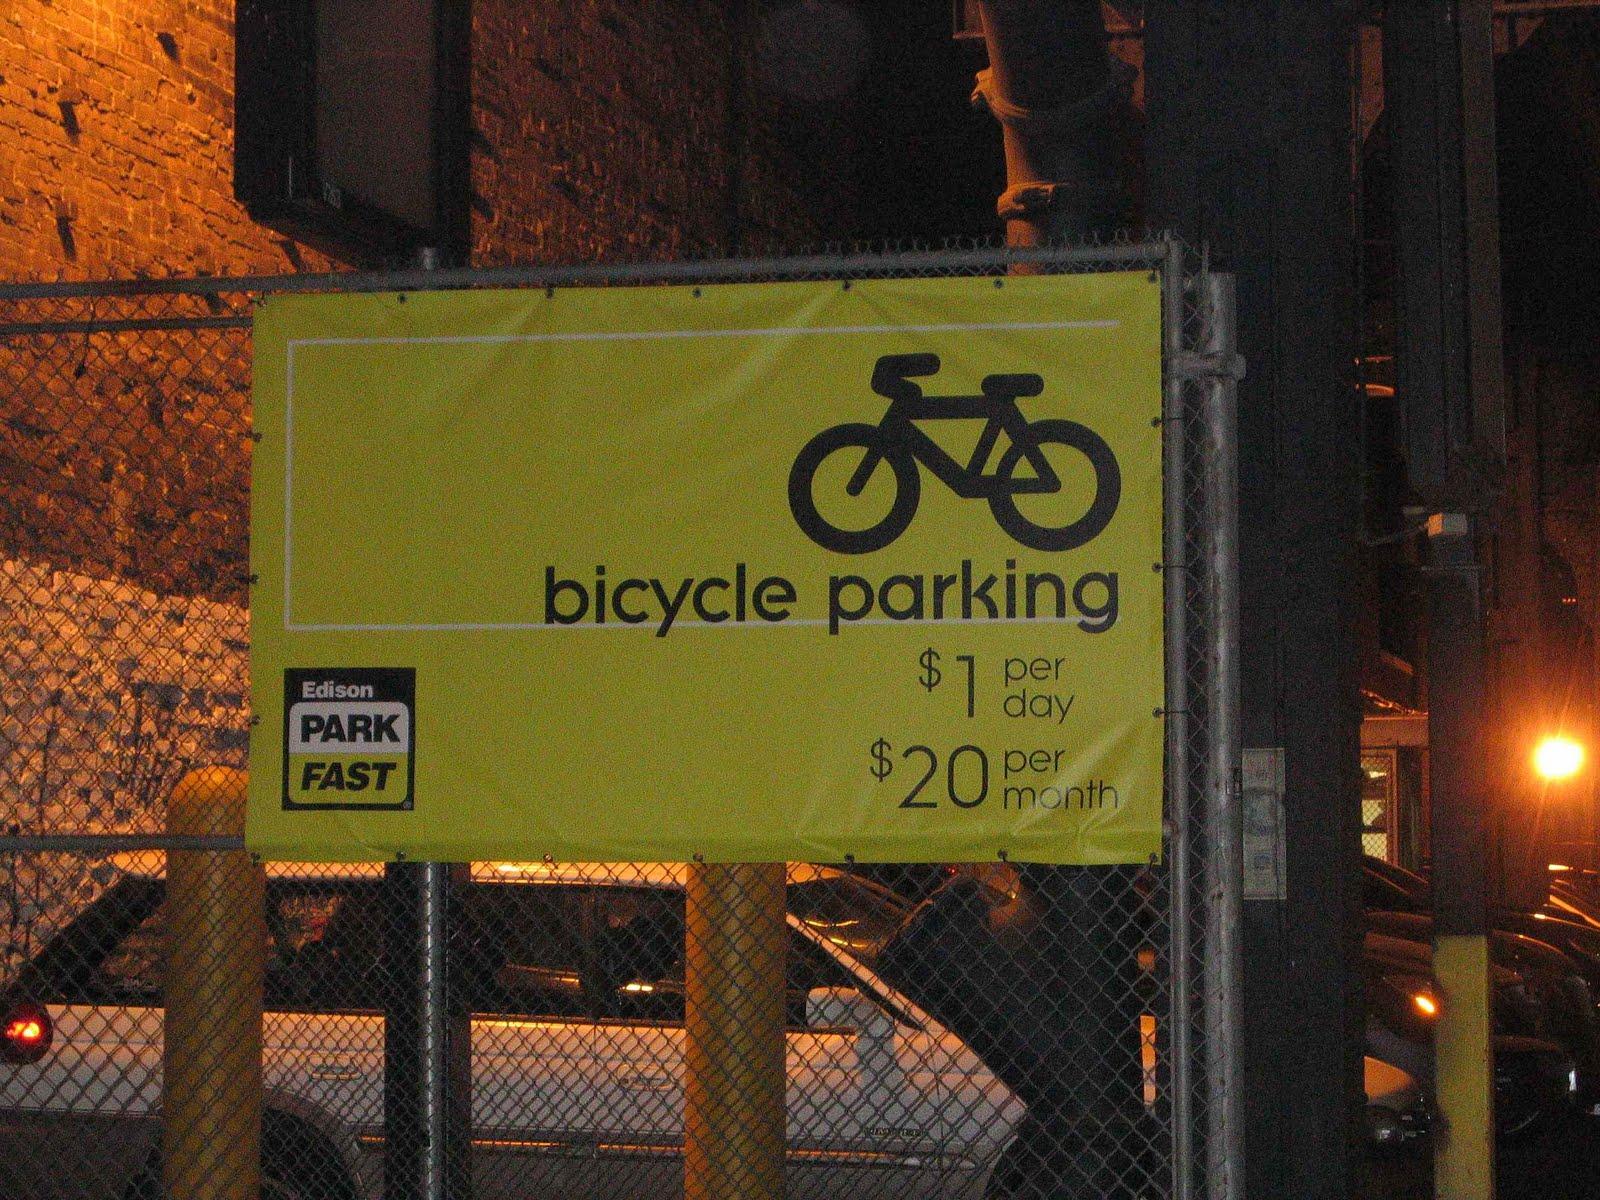 "<strong>Bike Parking under the Highline: America is Great</strong><br />(c) Benepe | <a href=""http://benepesbikeblog.blogspot.com/2011_07_01_archive.html"" target=""_blank"">http://benepesbikeblog.blogspot.com/2011_07_01_archive.html</a>"